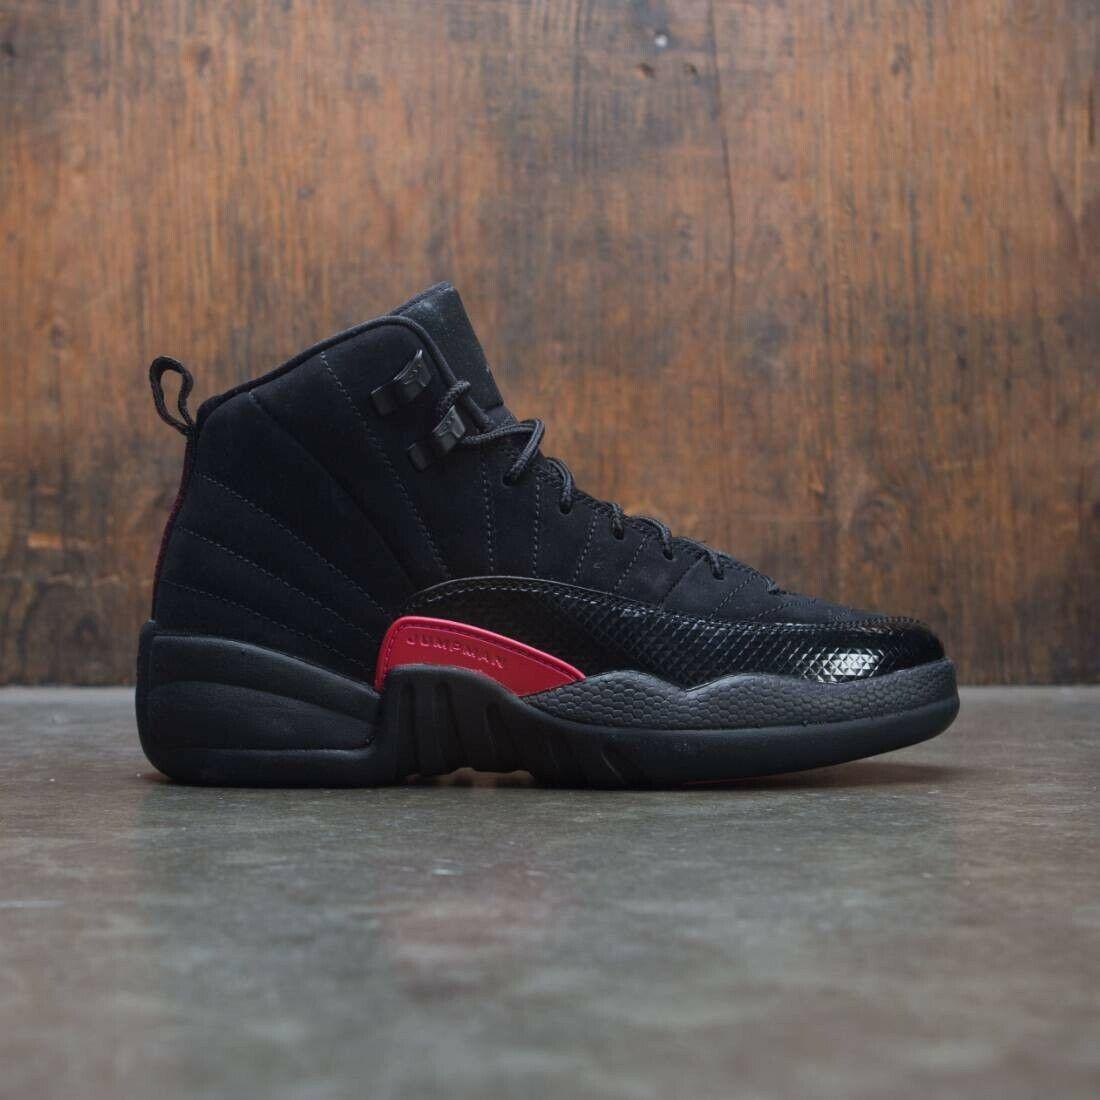 2018 Nike Air Jordan 12 XII Retro Black Rush Pink Size 8.5y. 510815-006 8.5